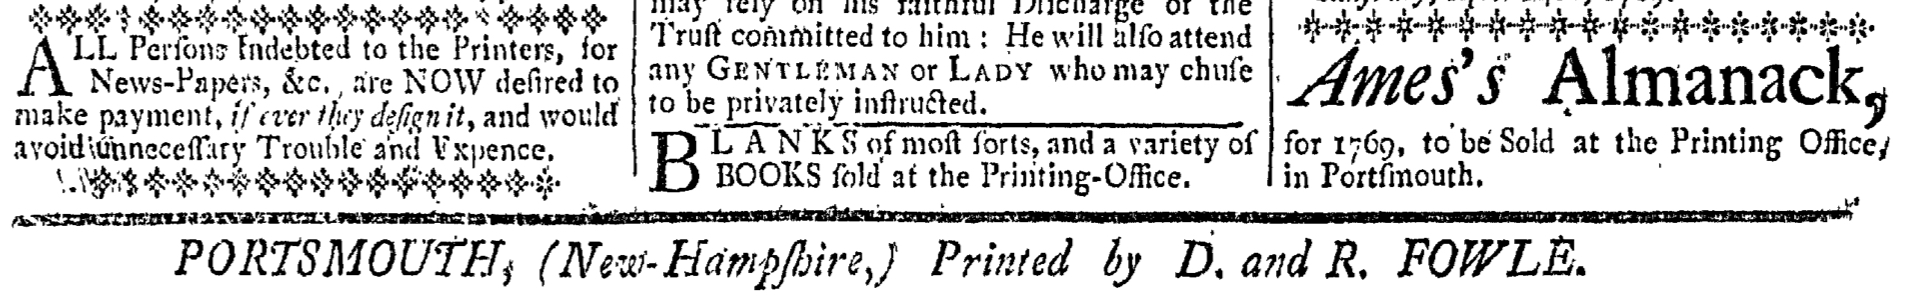 May 12 - 5:12:1769 New-Hampshire Gazette